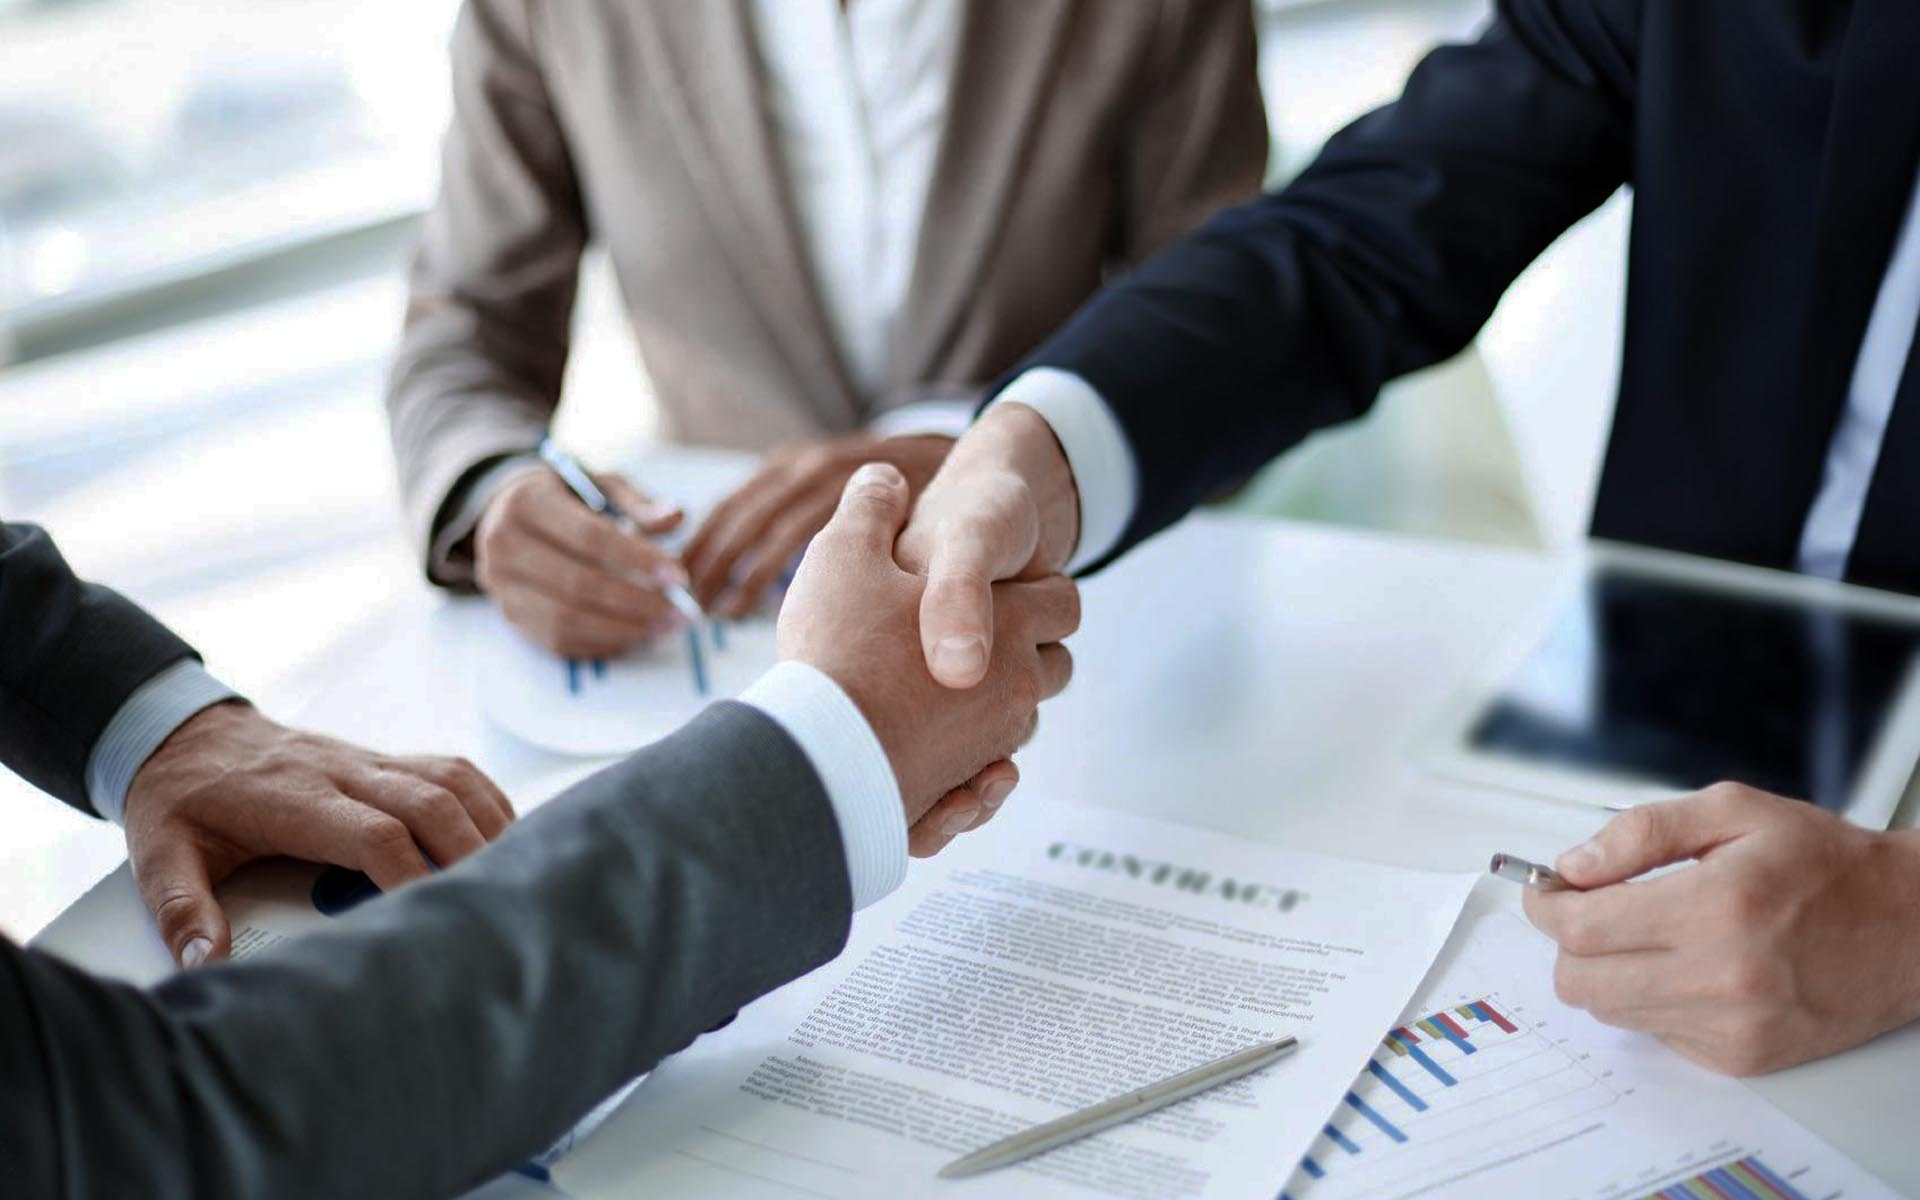 Ripple just announced a major new partnership with MoneyGram